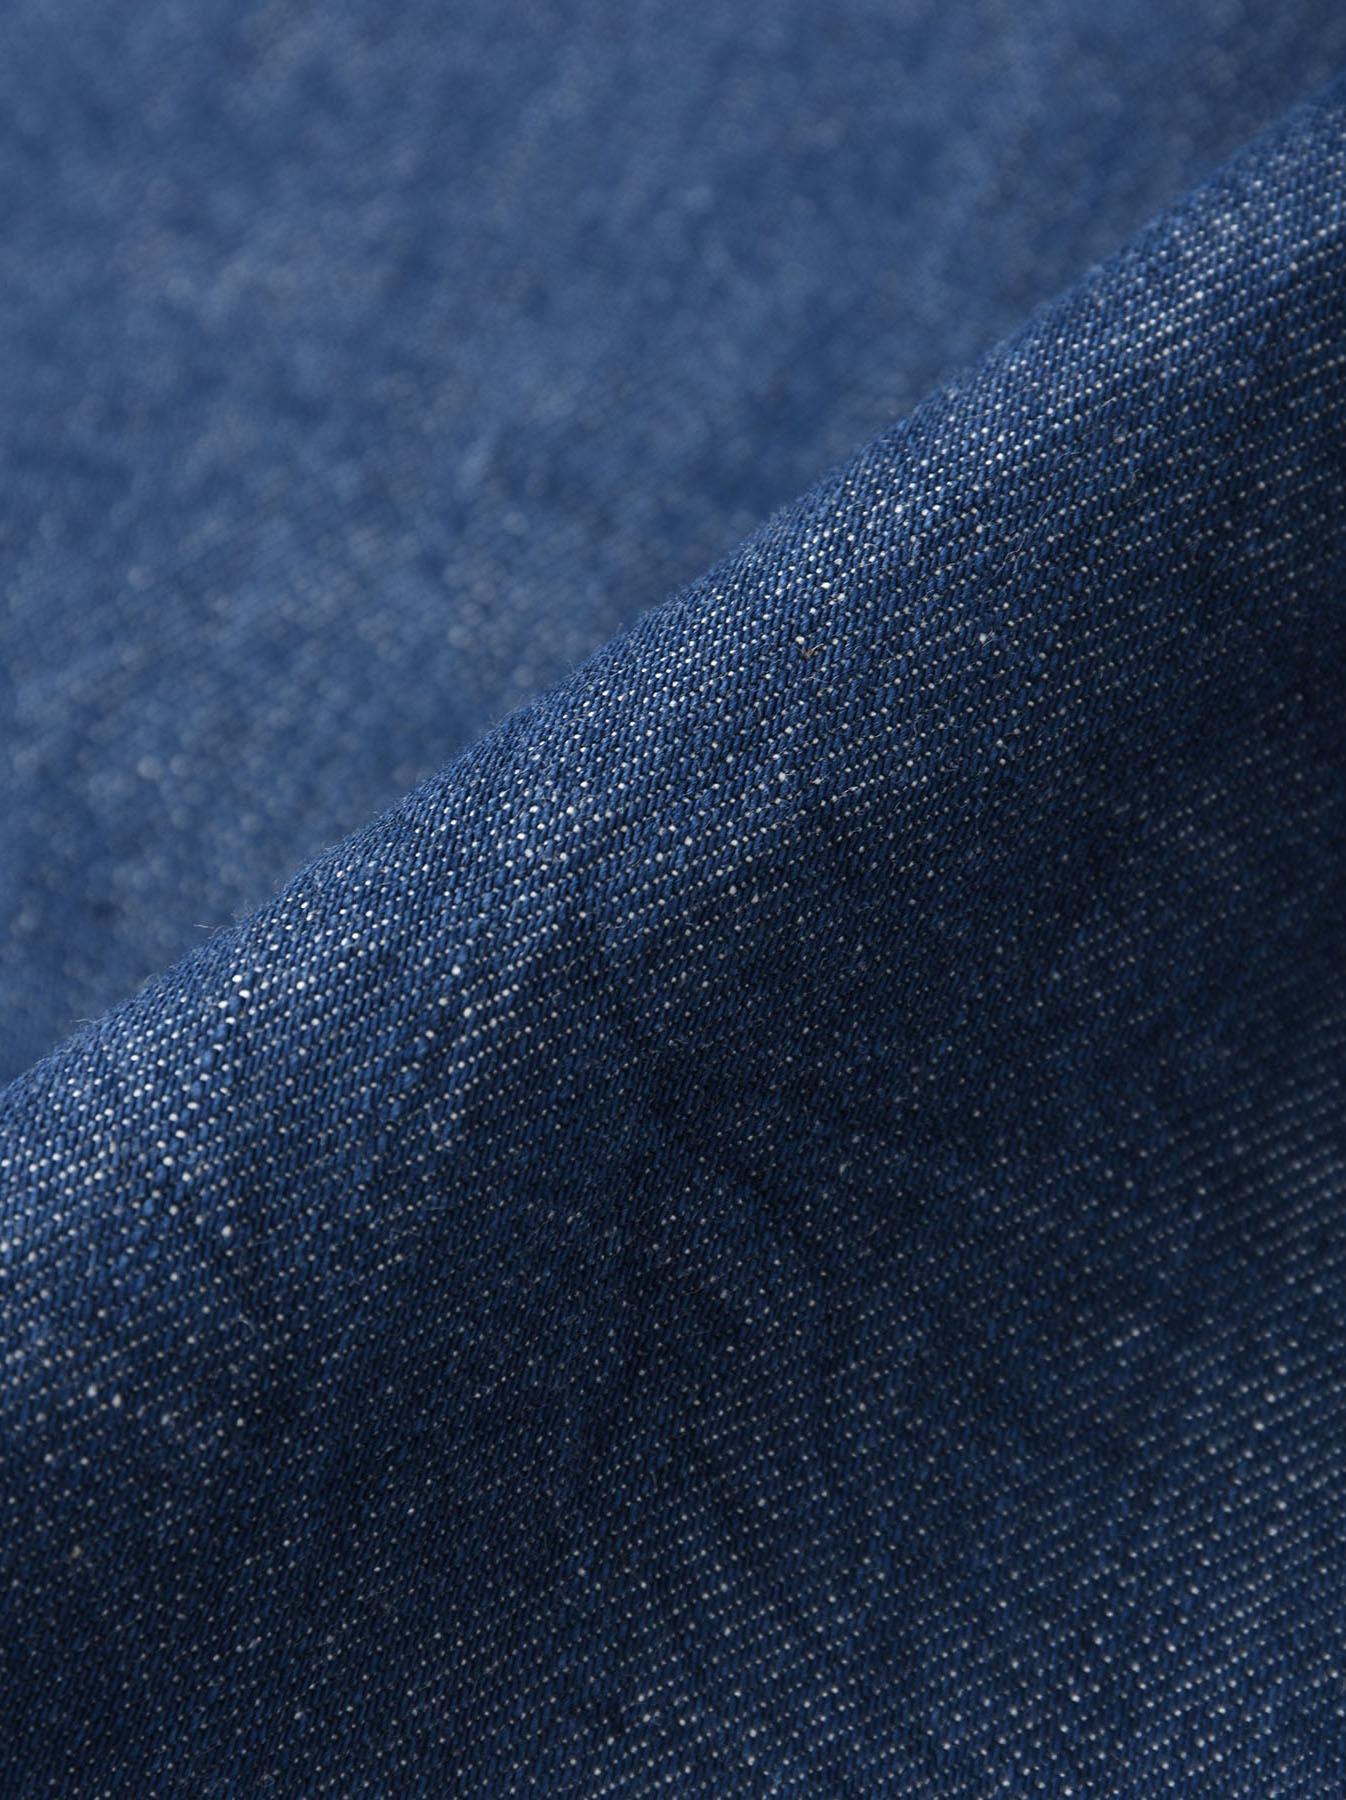 Distressed Mugi Denim Jacket-11